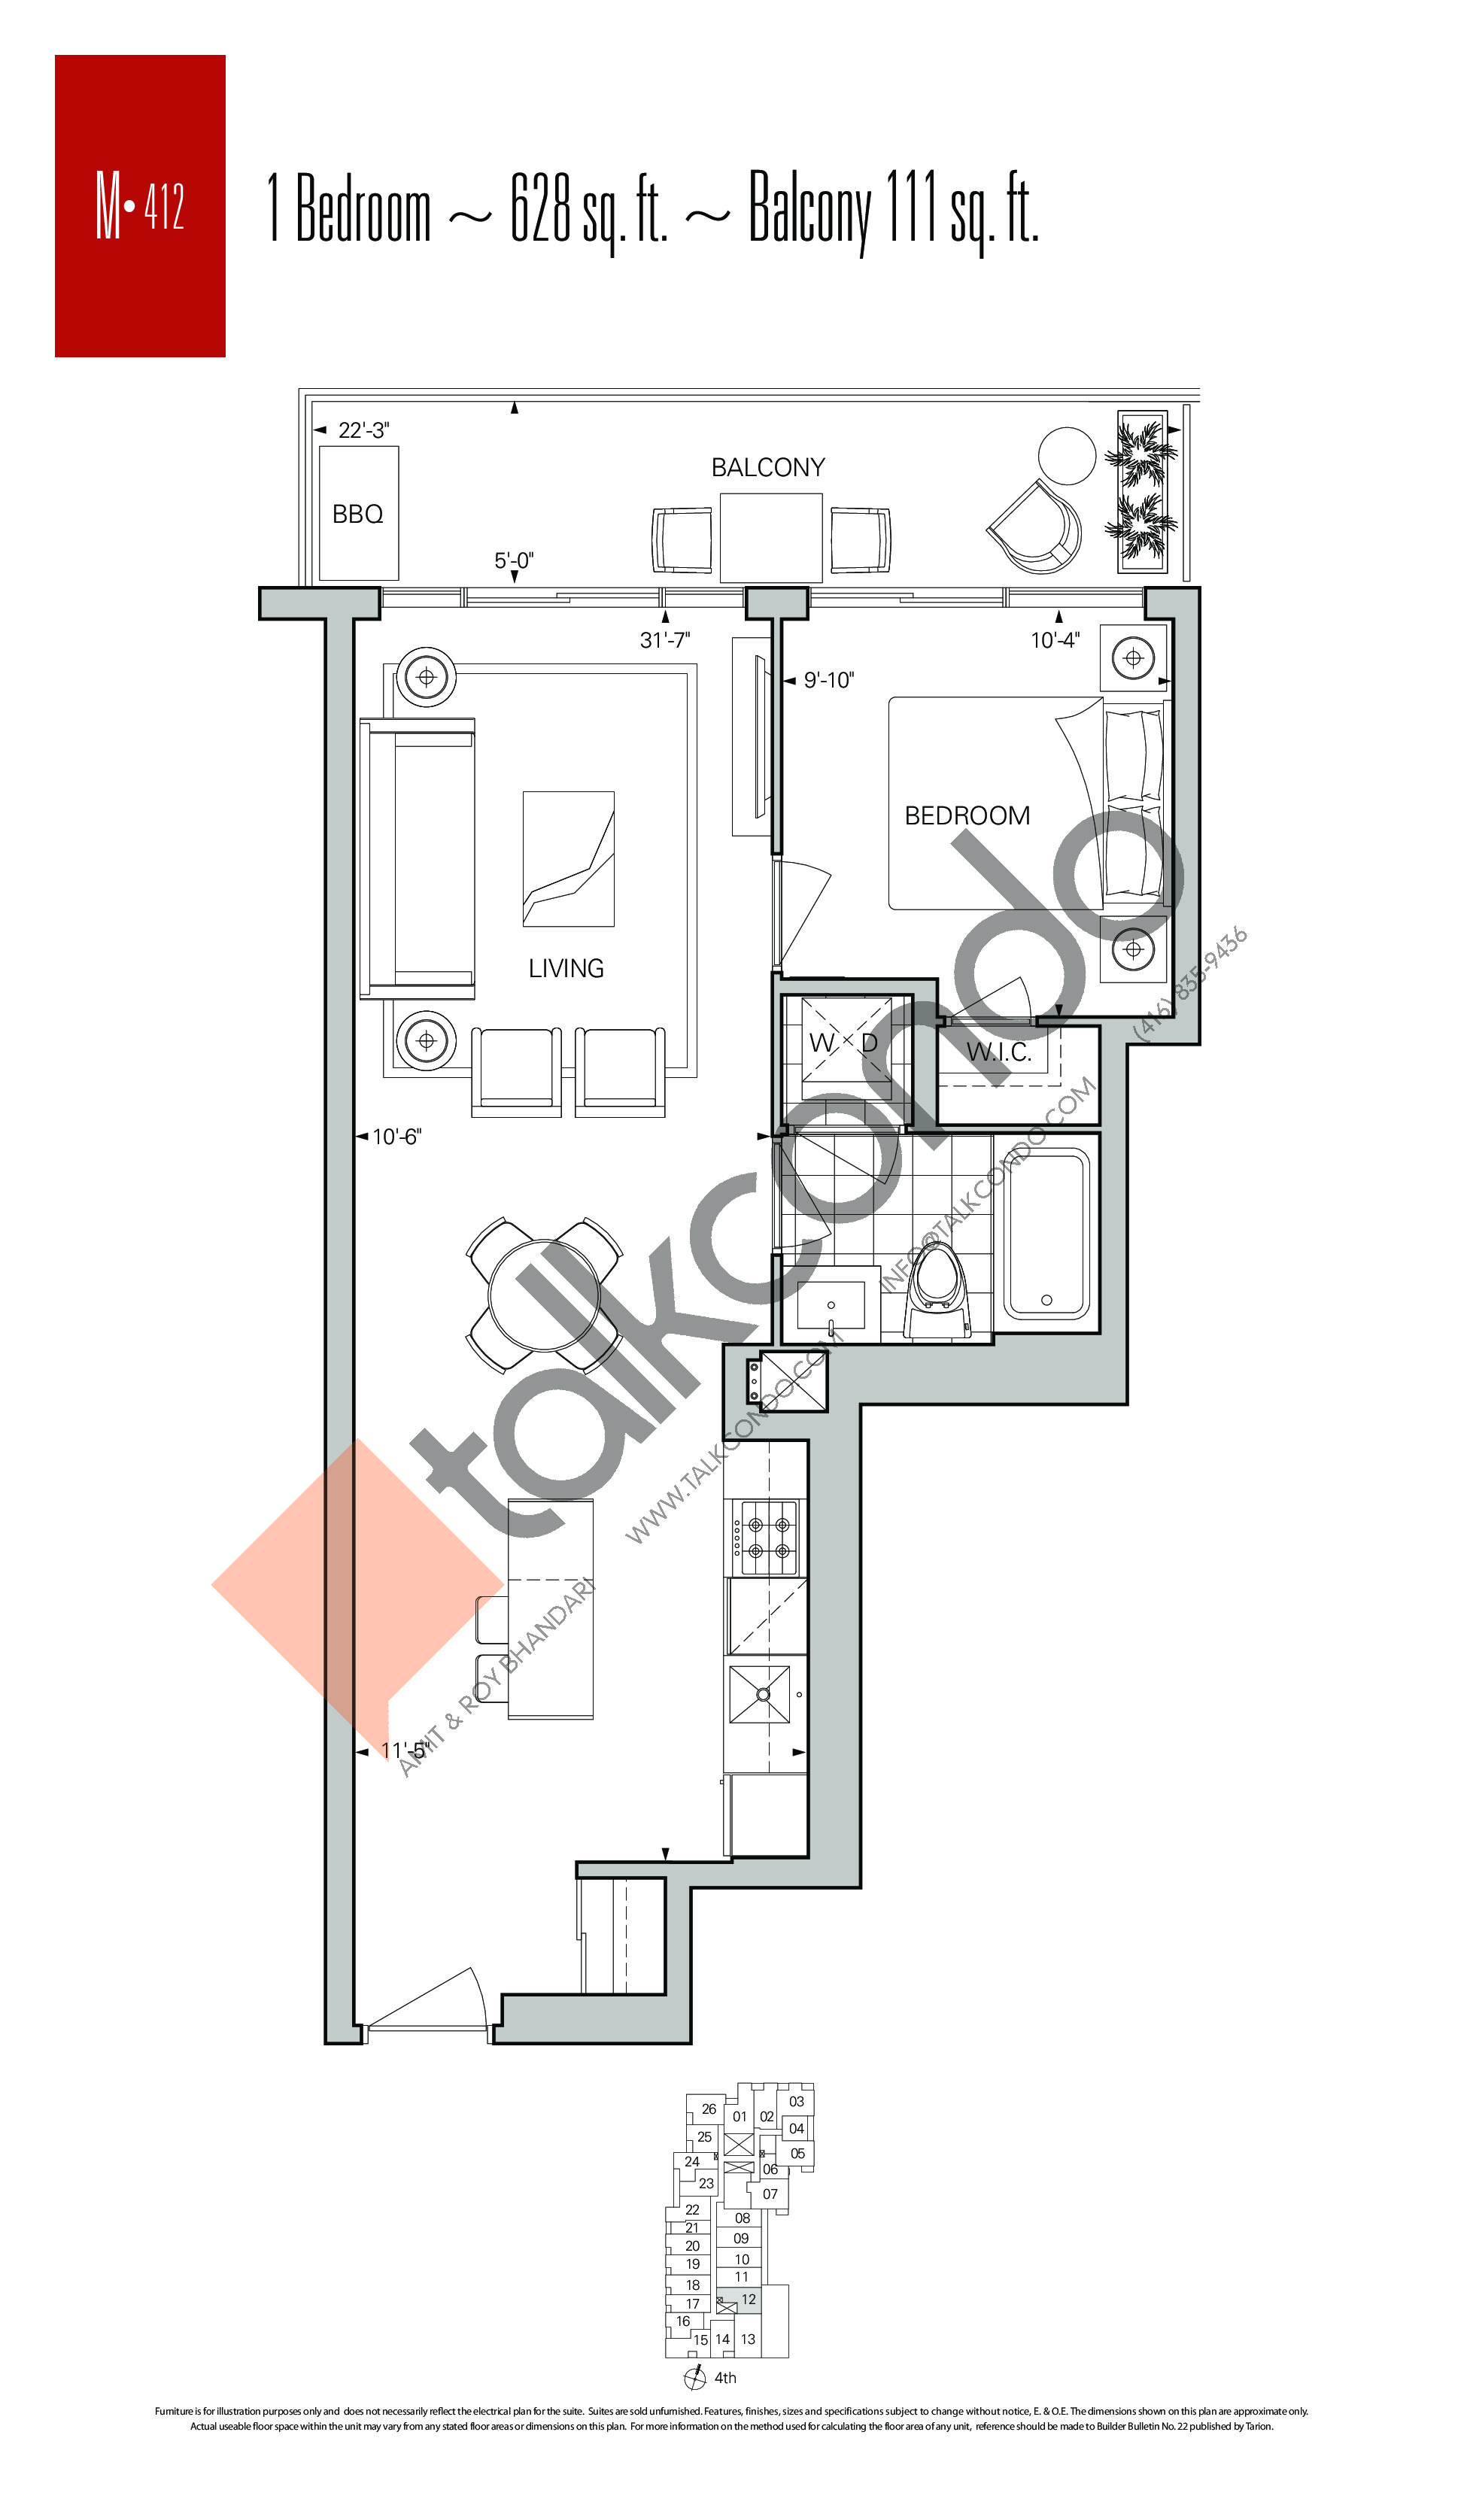 M-412 Floor Plan at Rise Condos - 628 sq.ft